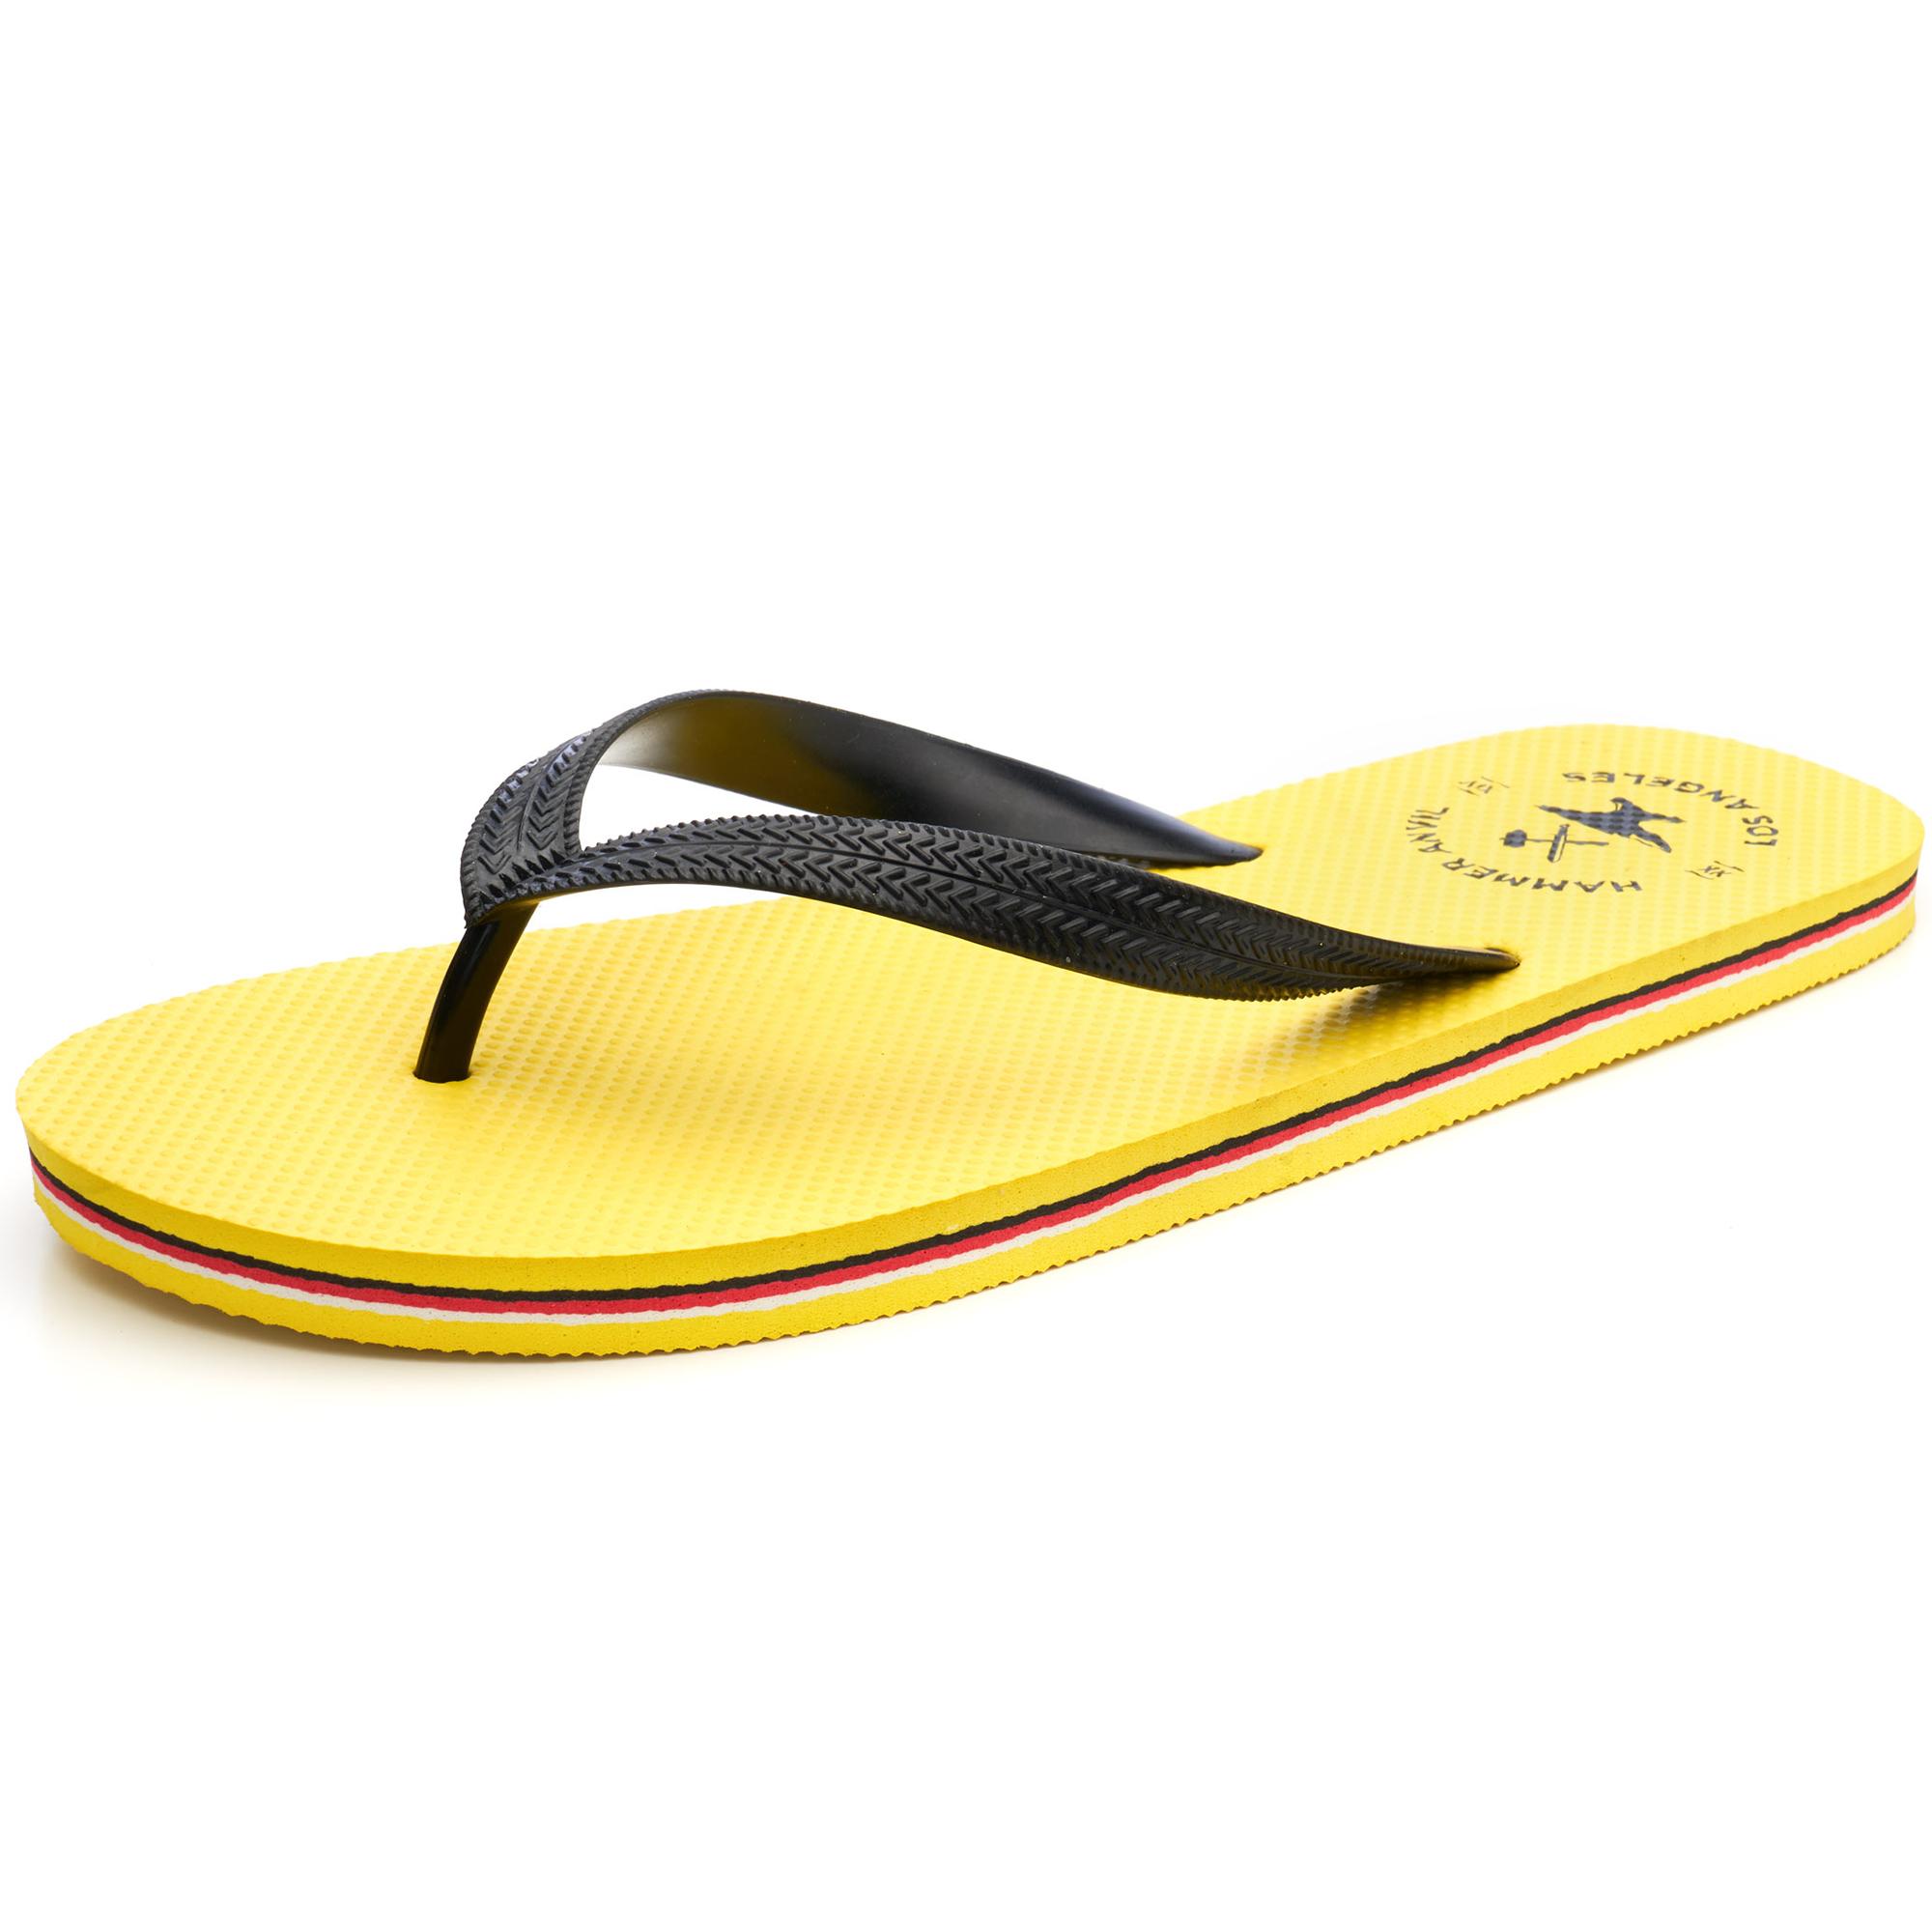 Hammer-Anvil-Mens-Flip-Flops-Casual-Thong-Summer-Sandals-Comfortable-Beach-Shoes thumbnail 46